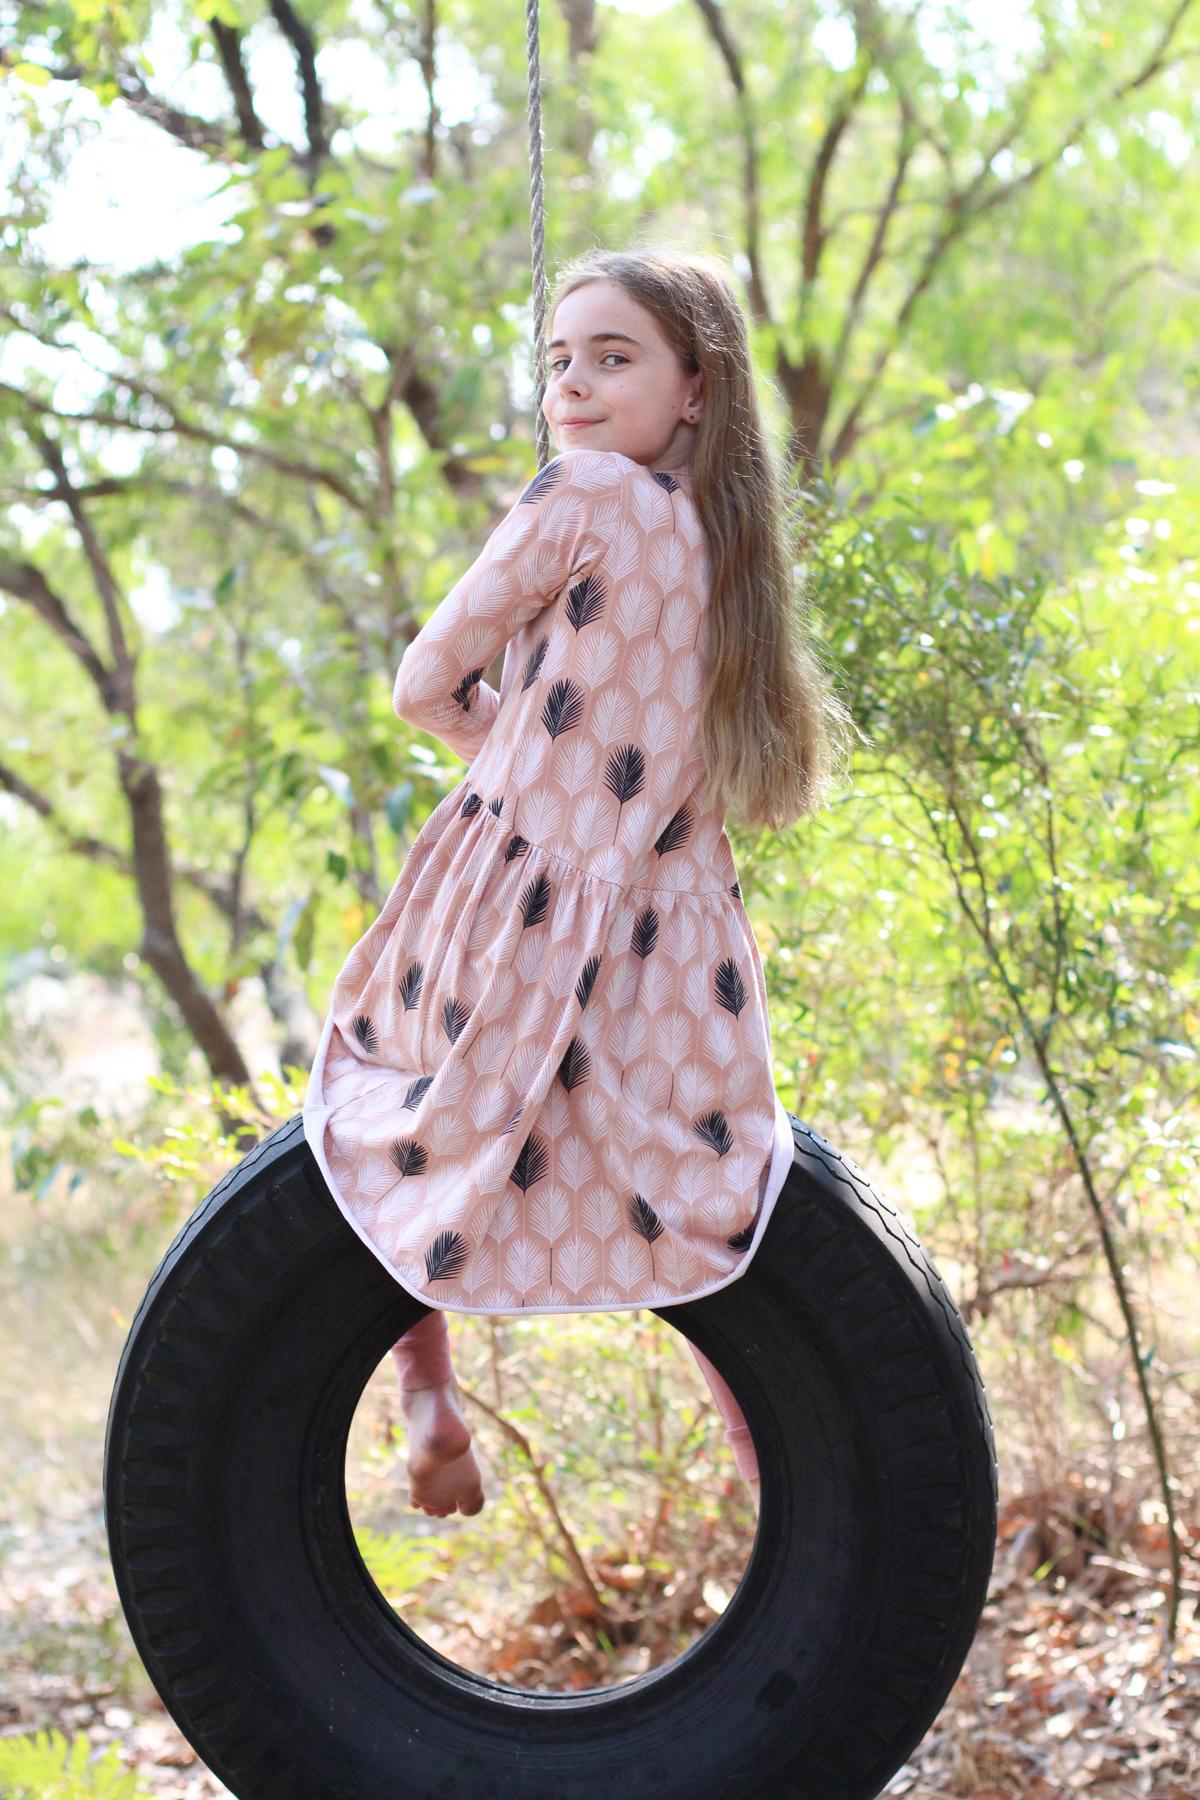 Bunny's Briar dress using Nosh Organics feather print organic cotton jersey // Megan Nielsen Design Diary